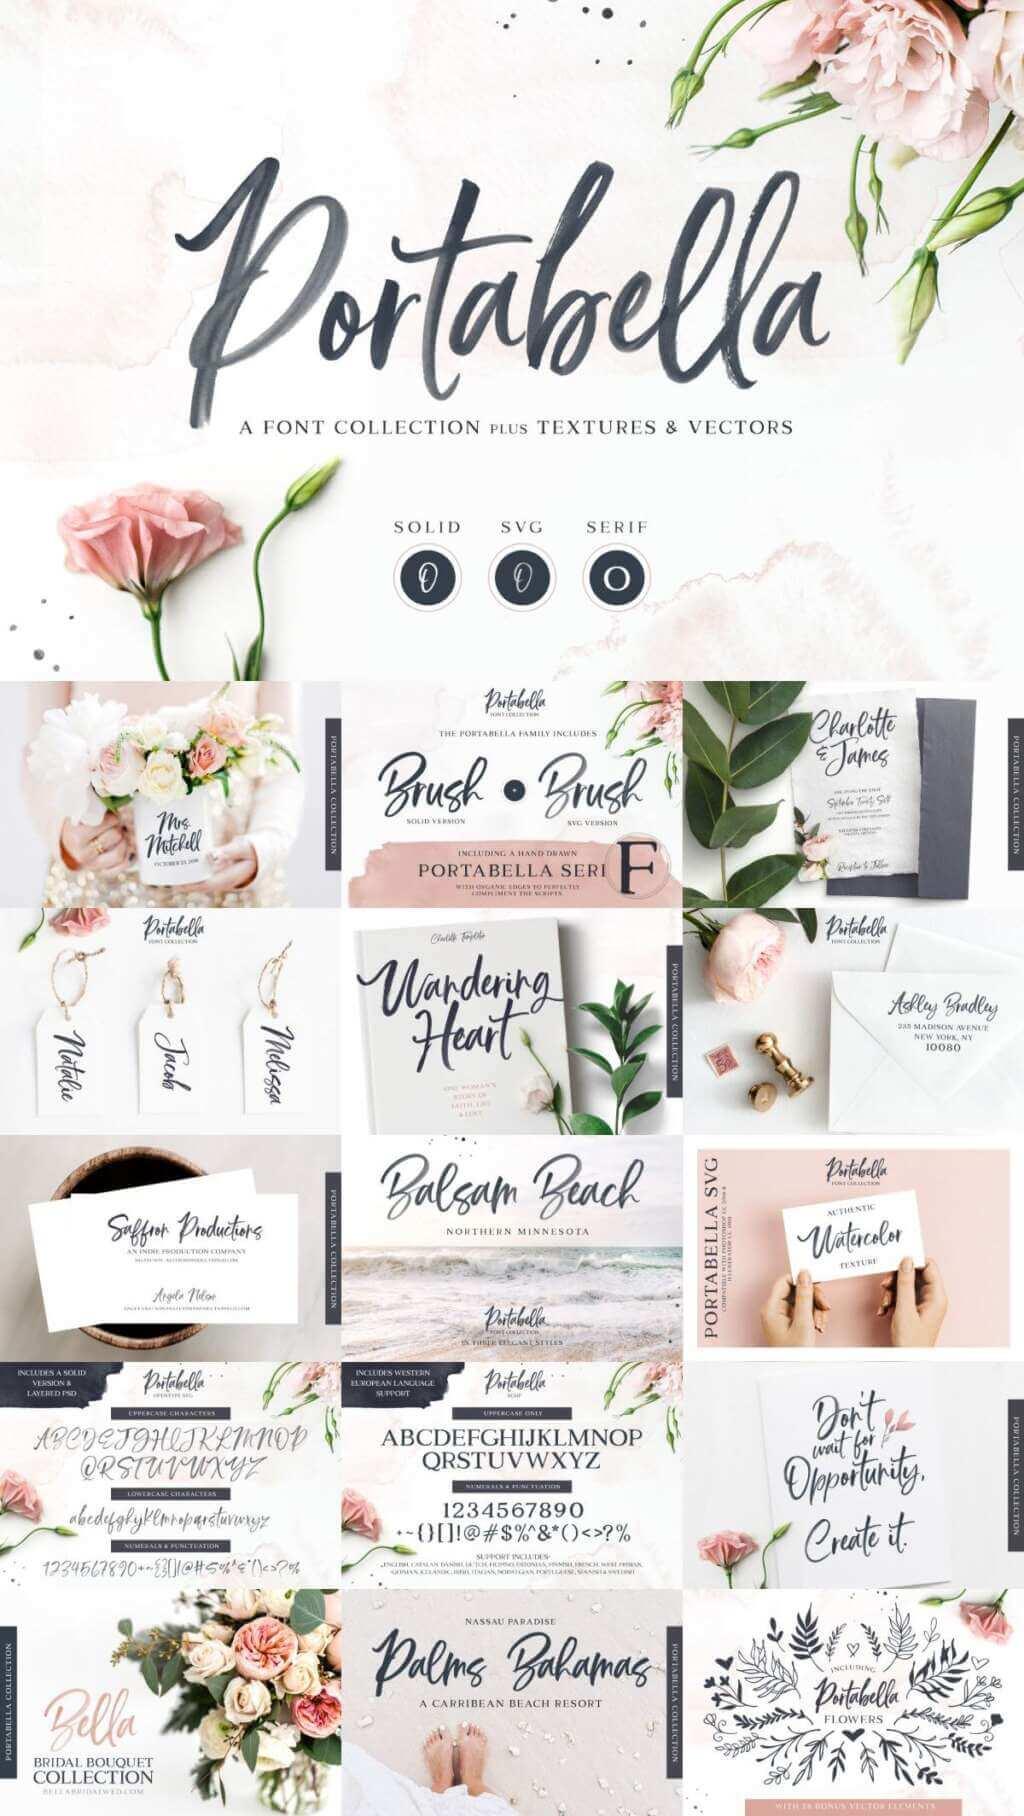 Portabella Font Collection